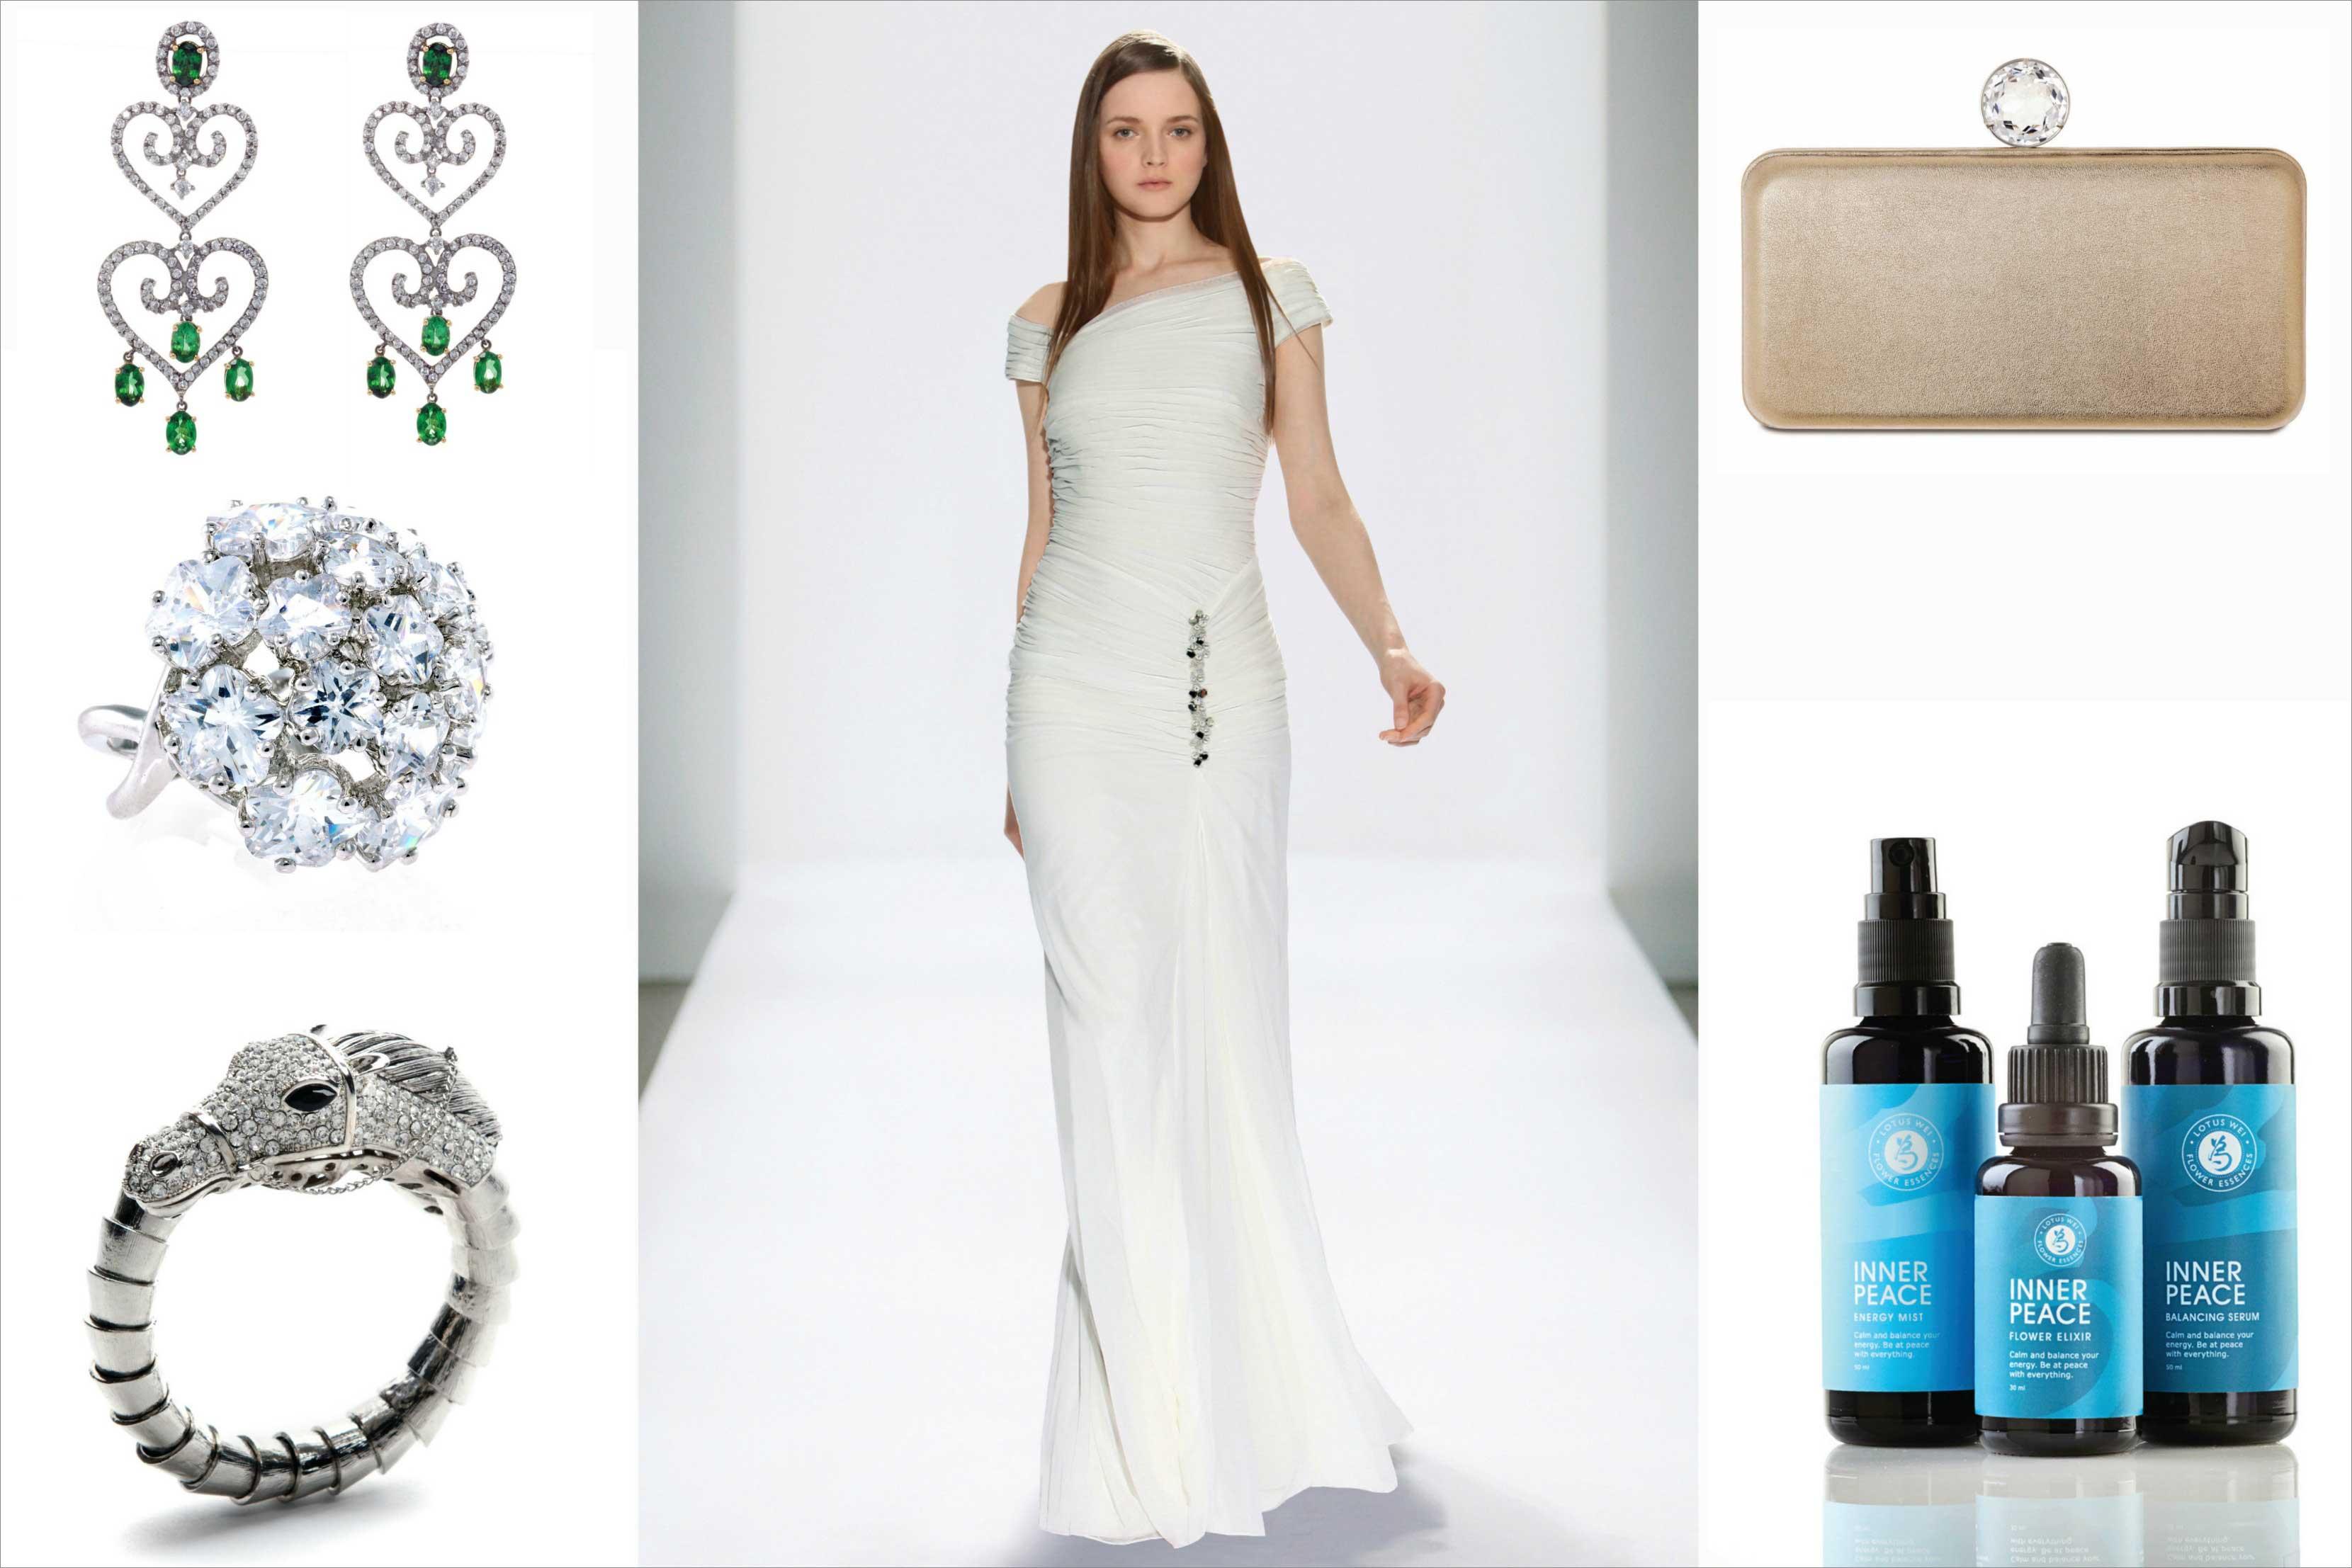 Royal Wedding maid of honor Pippa ideas